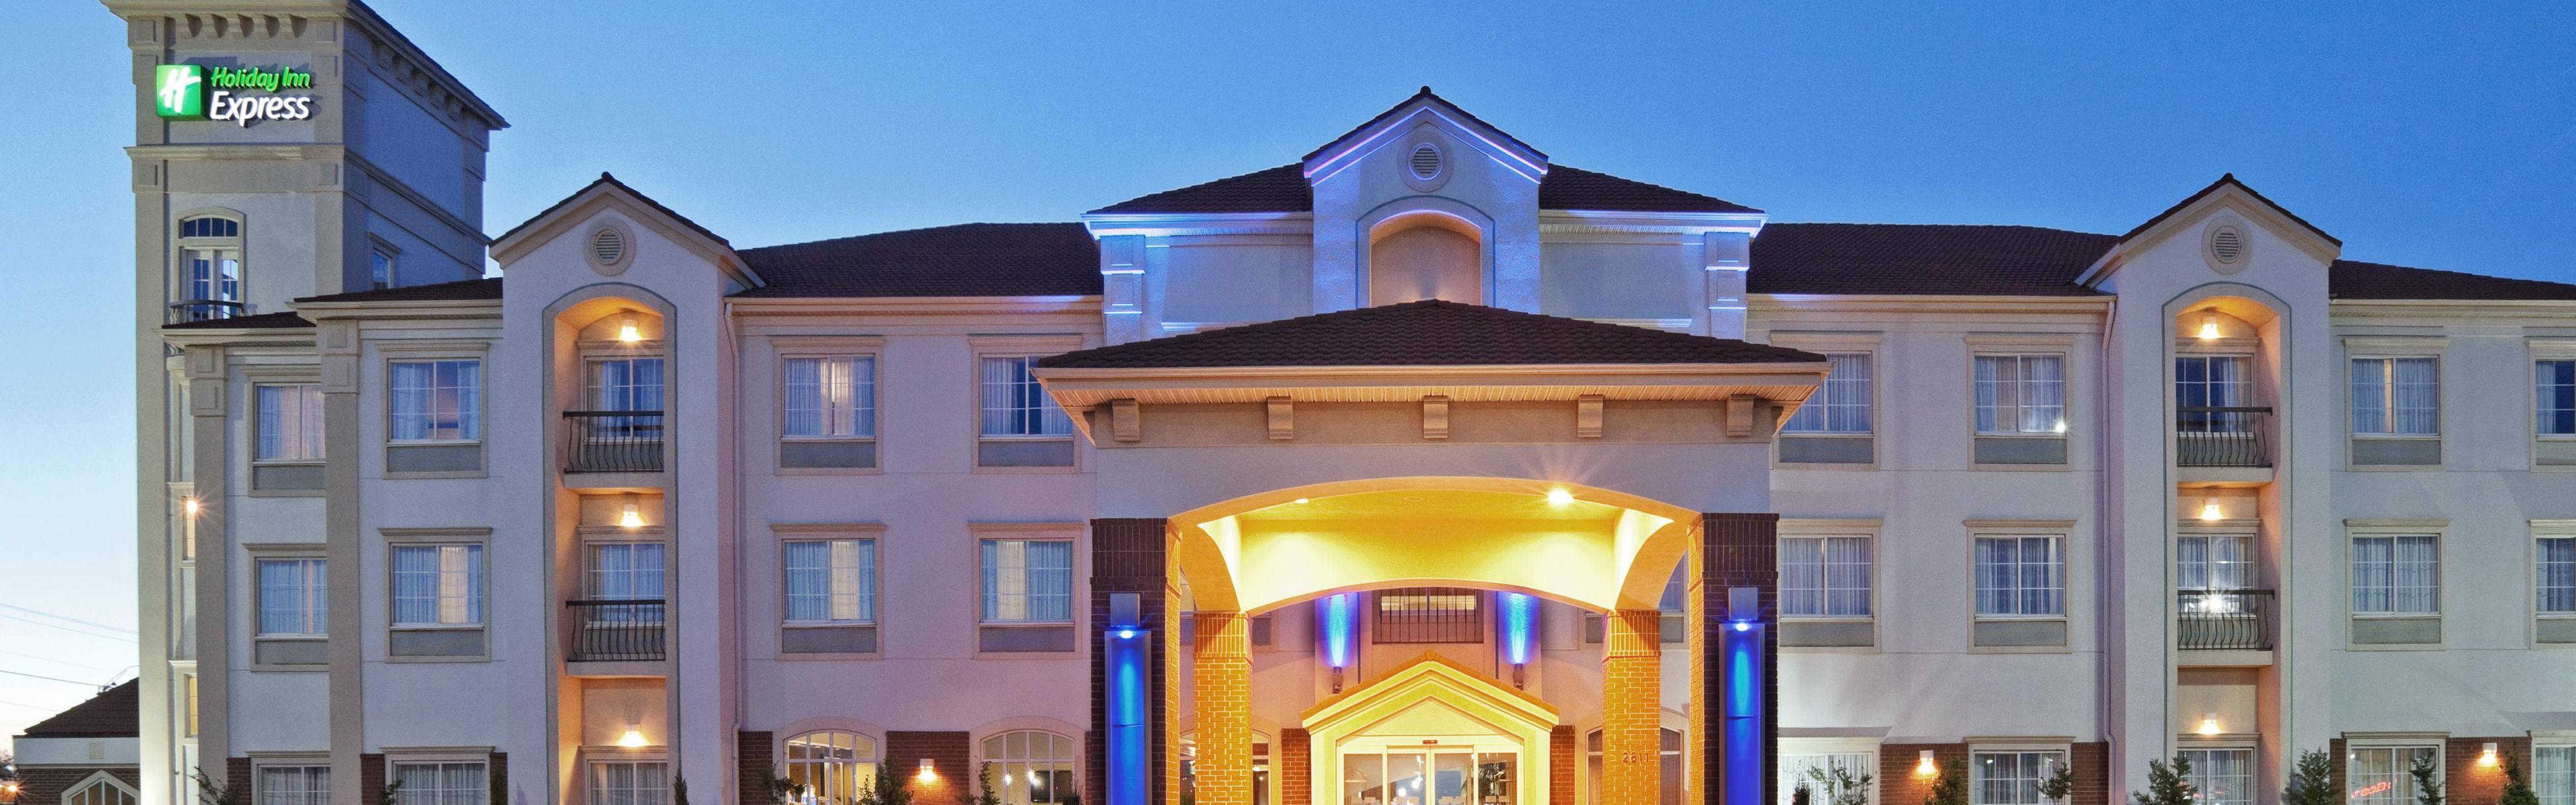 Holiday Inn Express & Suites Oklahoma City-Penn Square image 0